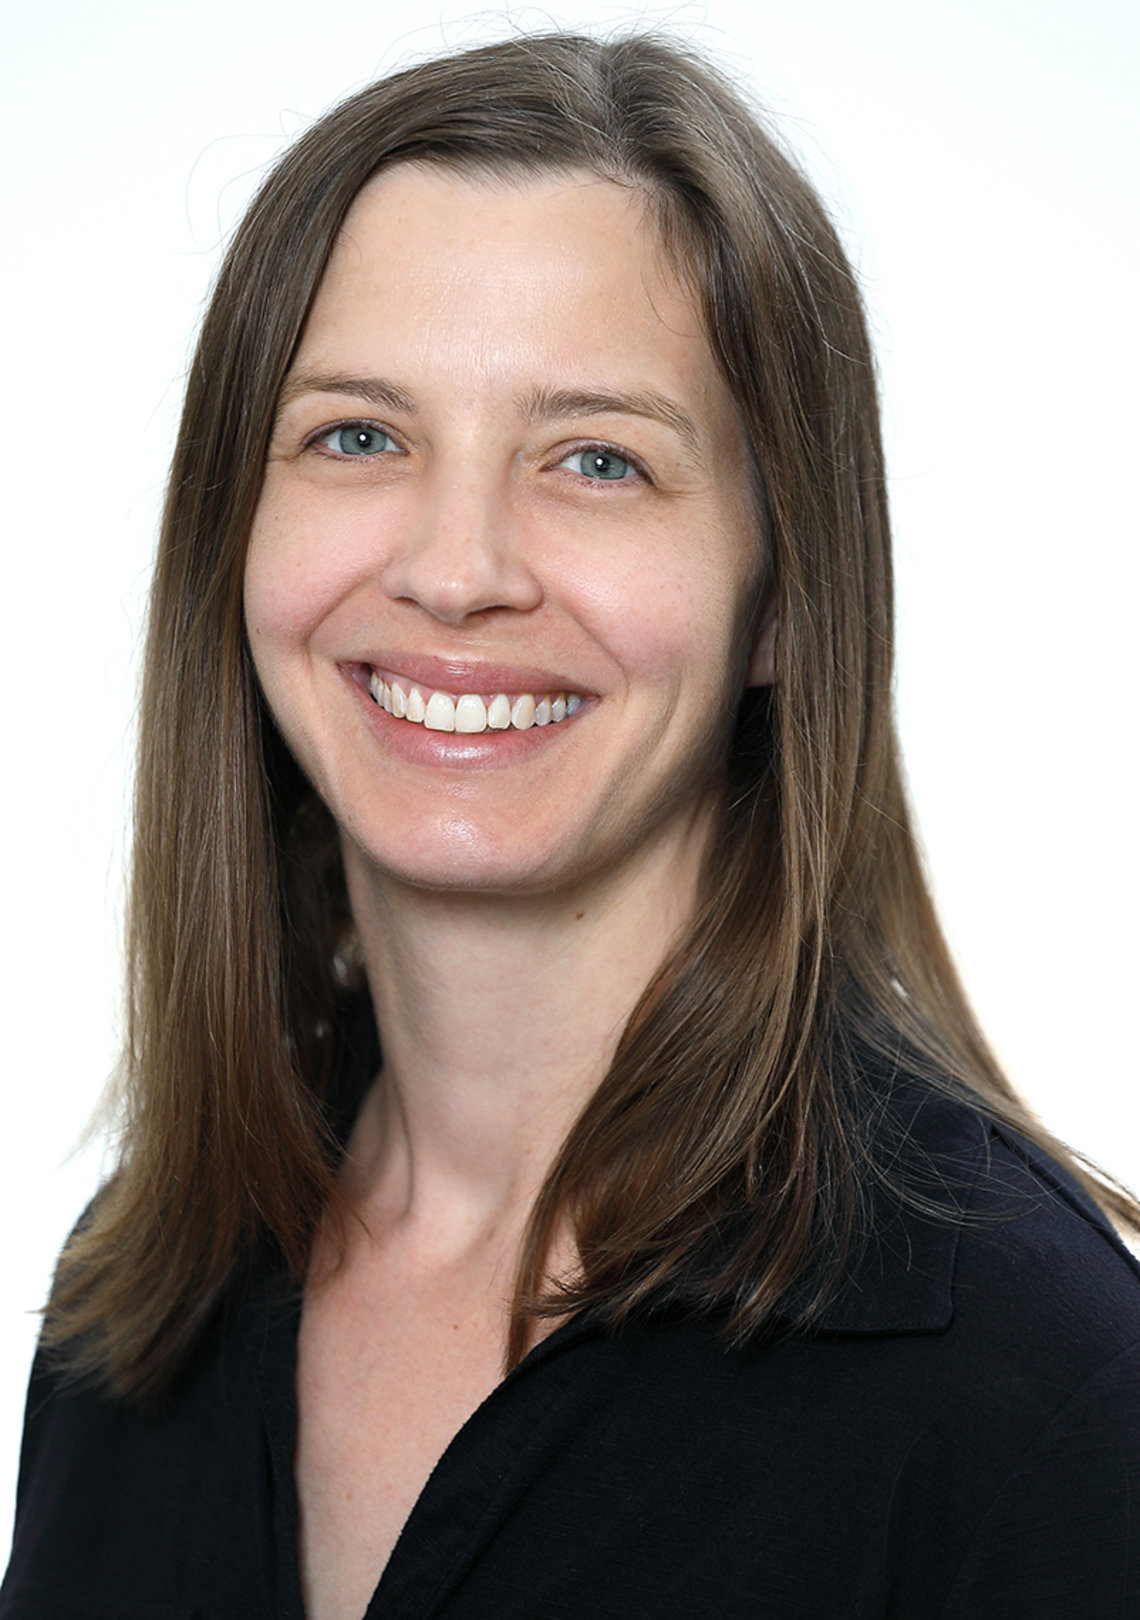 Dr. Catherine Weisz